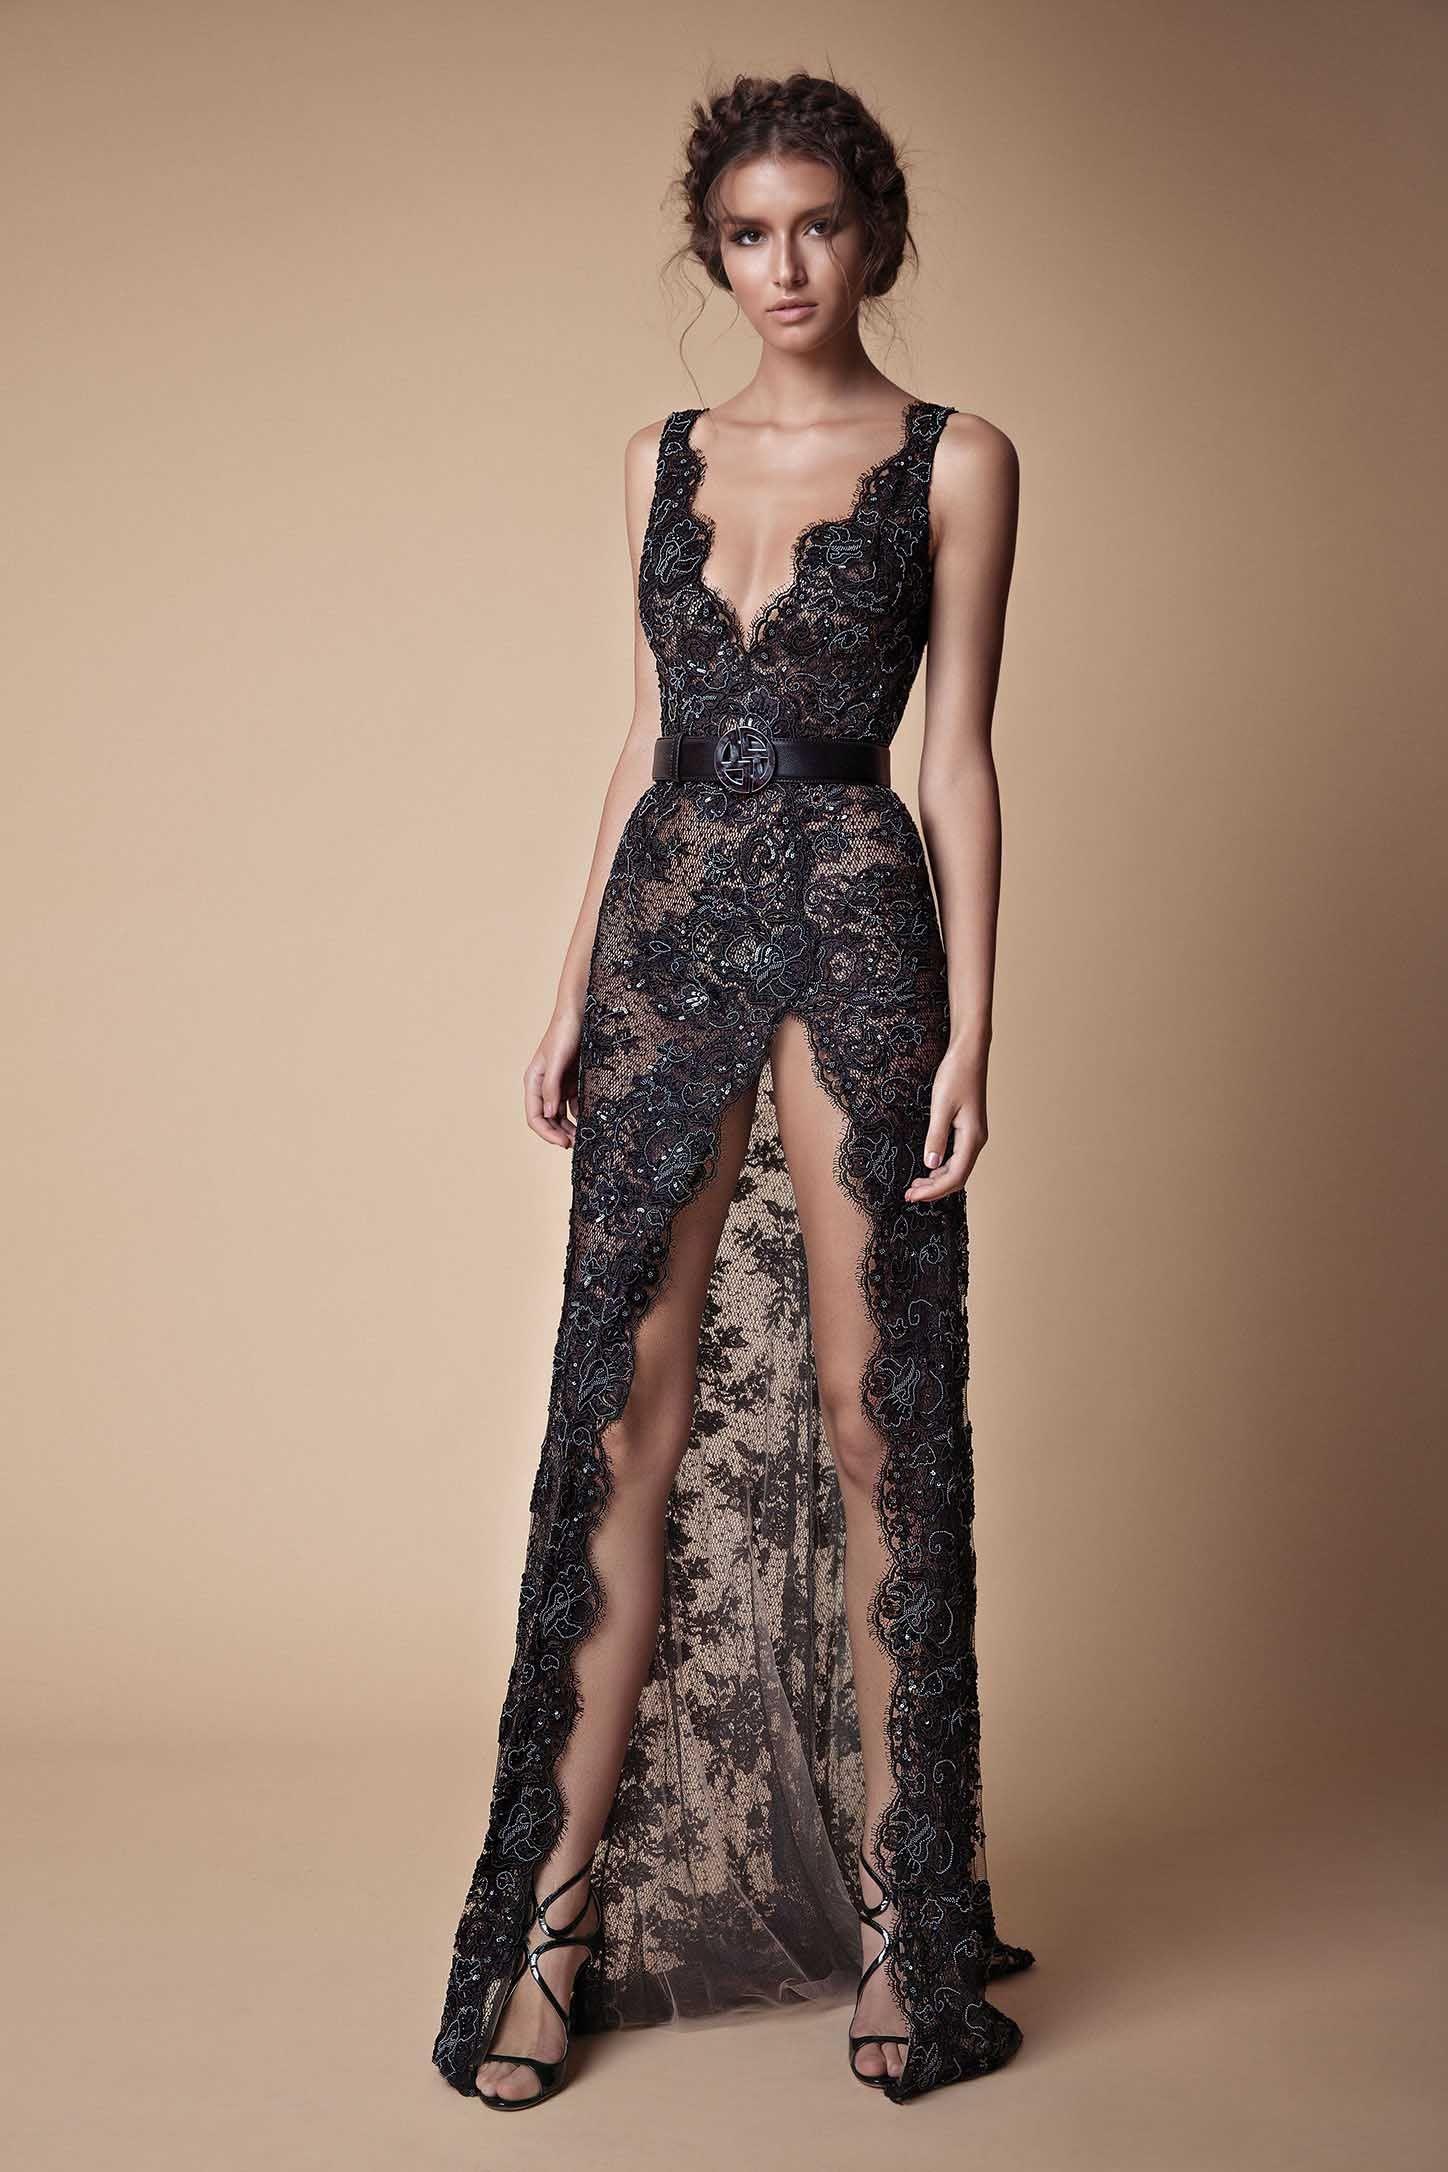 B l a c k abbigliamento pinterest split prom dresses